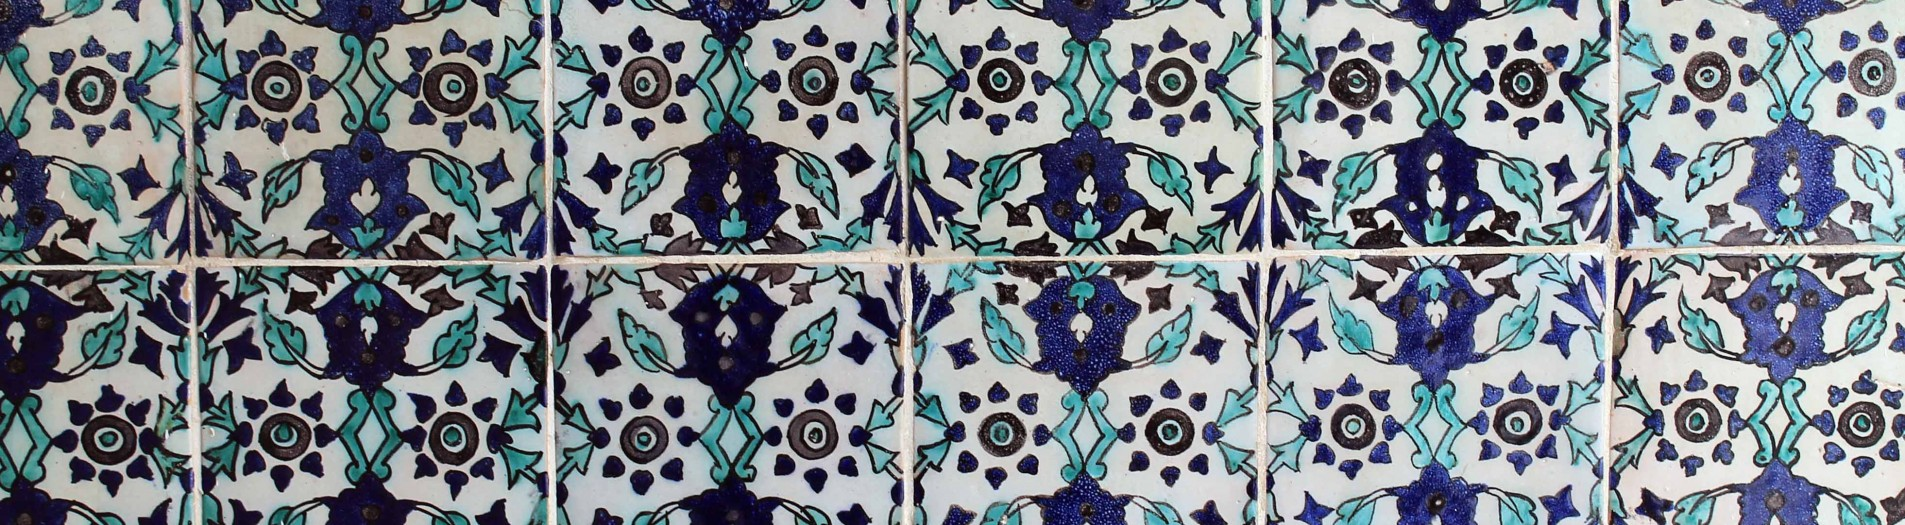 Céramique de la Tunisie